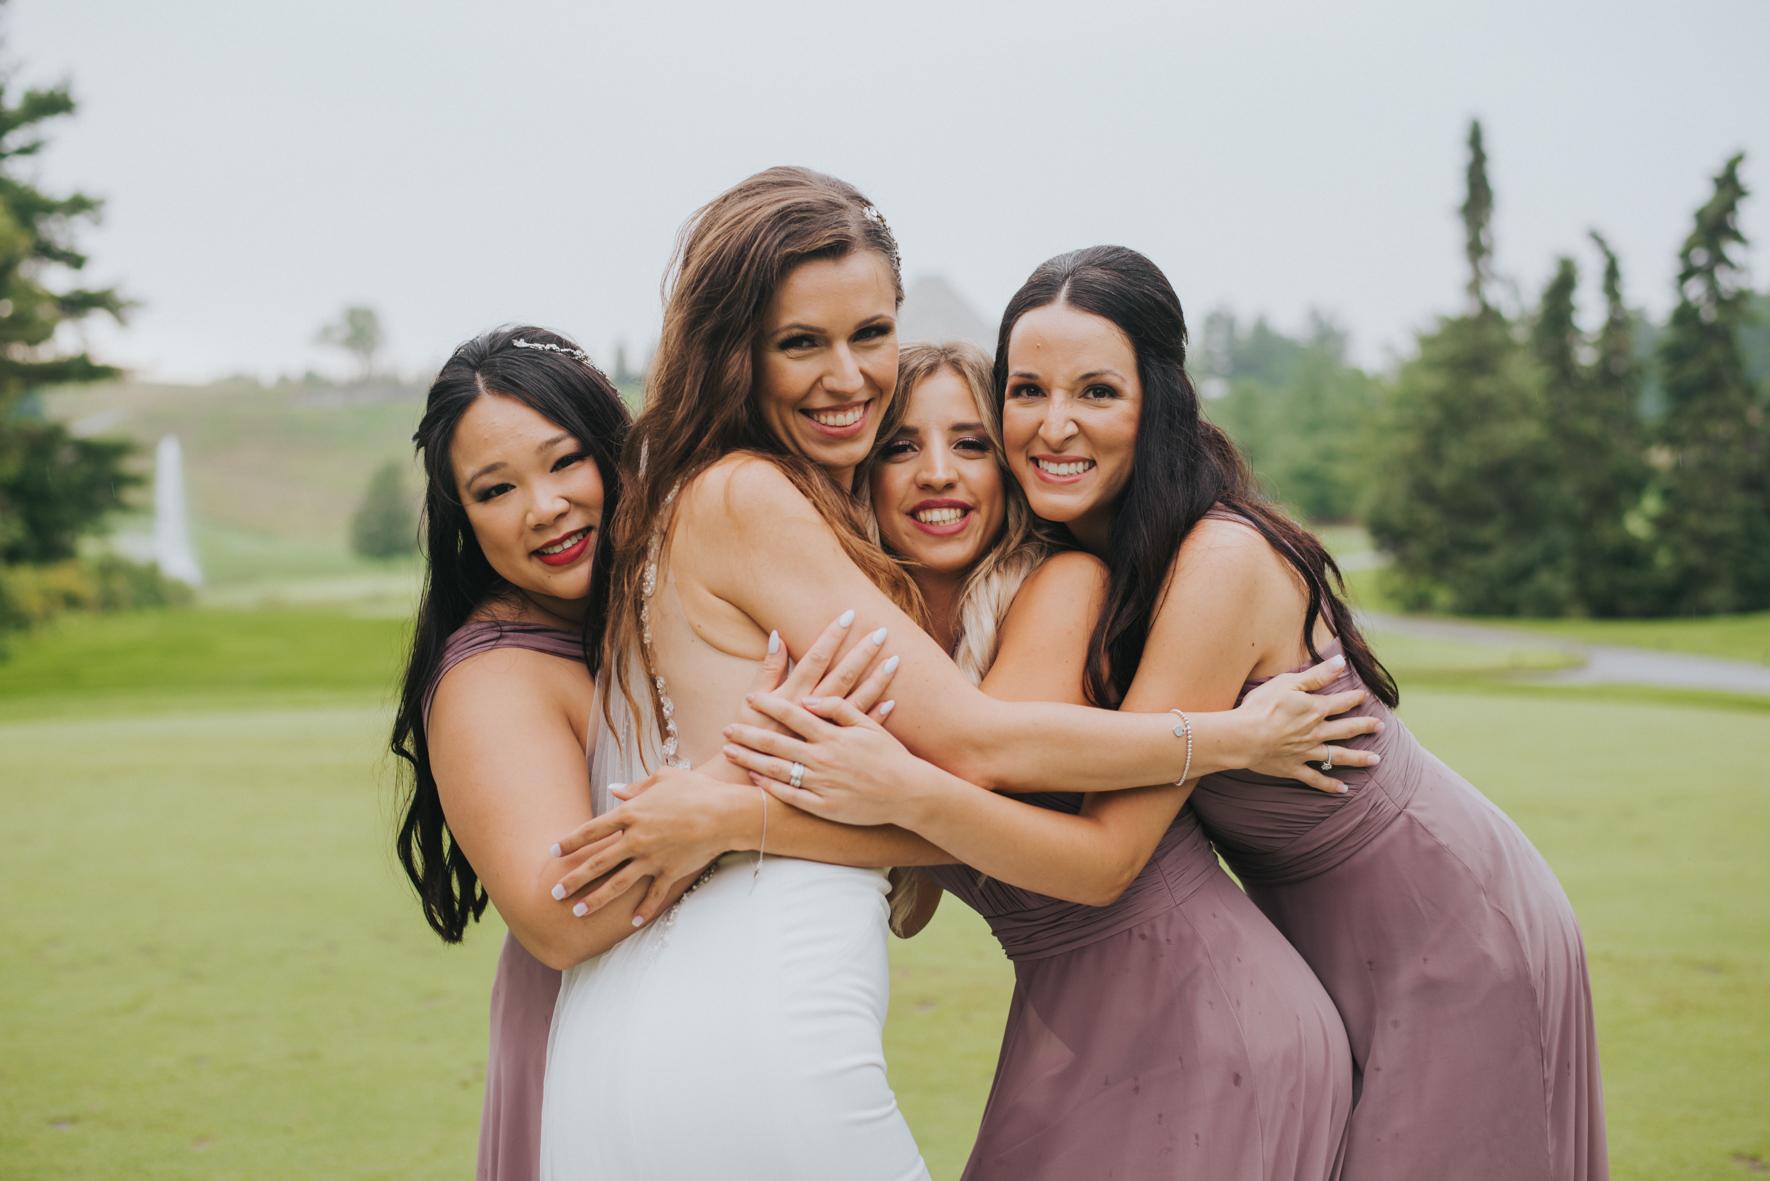 sandy-jana-copper-creek-golf-club-slovak-wedding-toronto-scandaleuse-photography-weddings-26.jpg